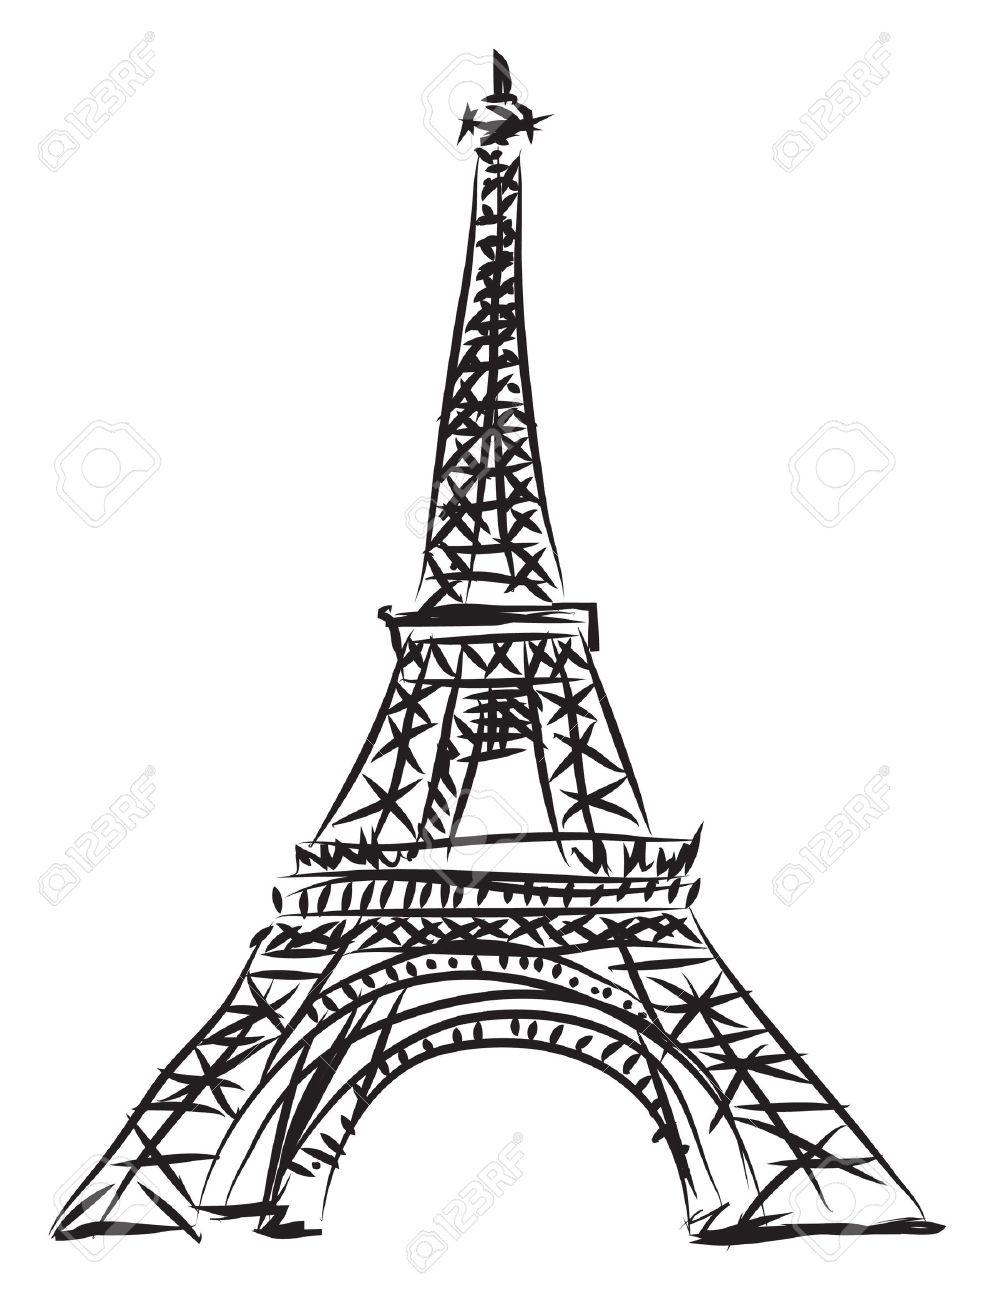 995x1300 Eiffel Tower Line Drawing How To Draw Eiffel Tower